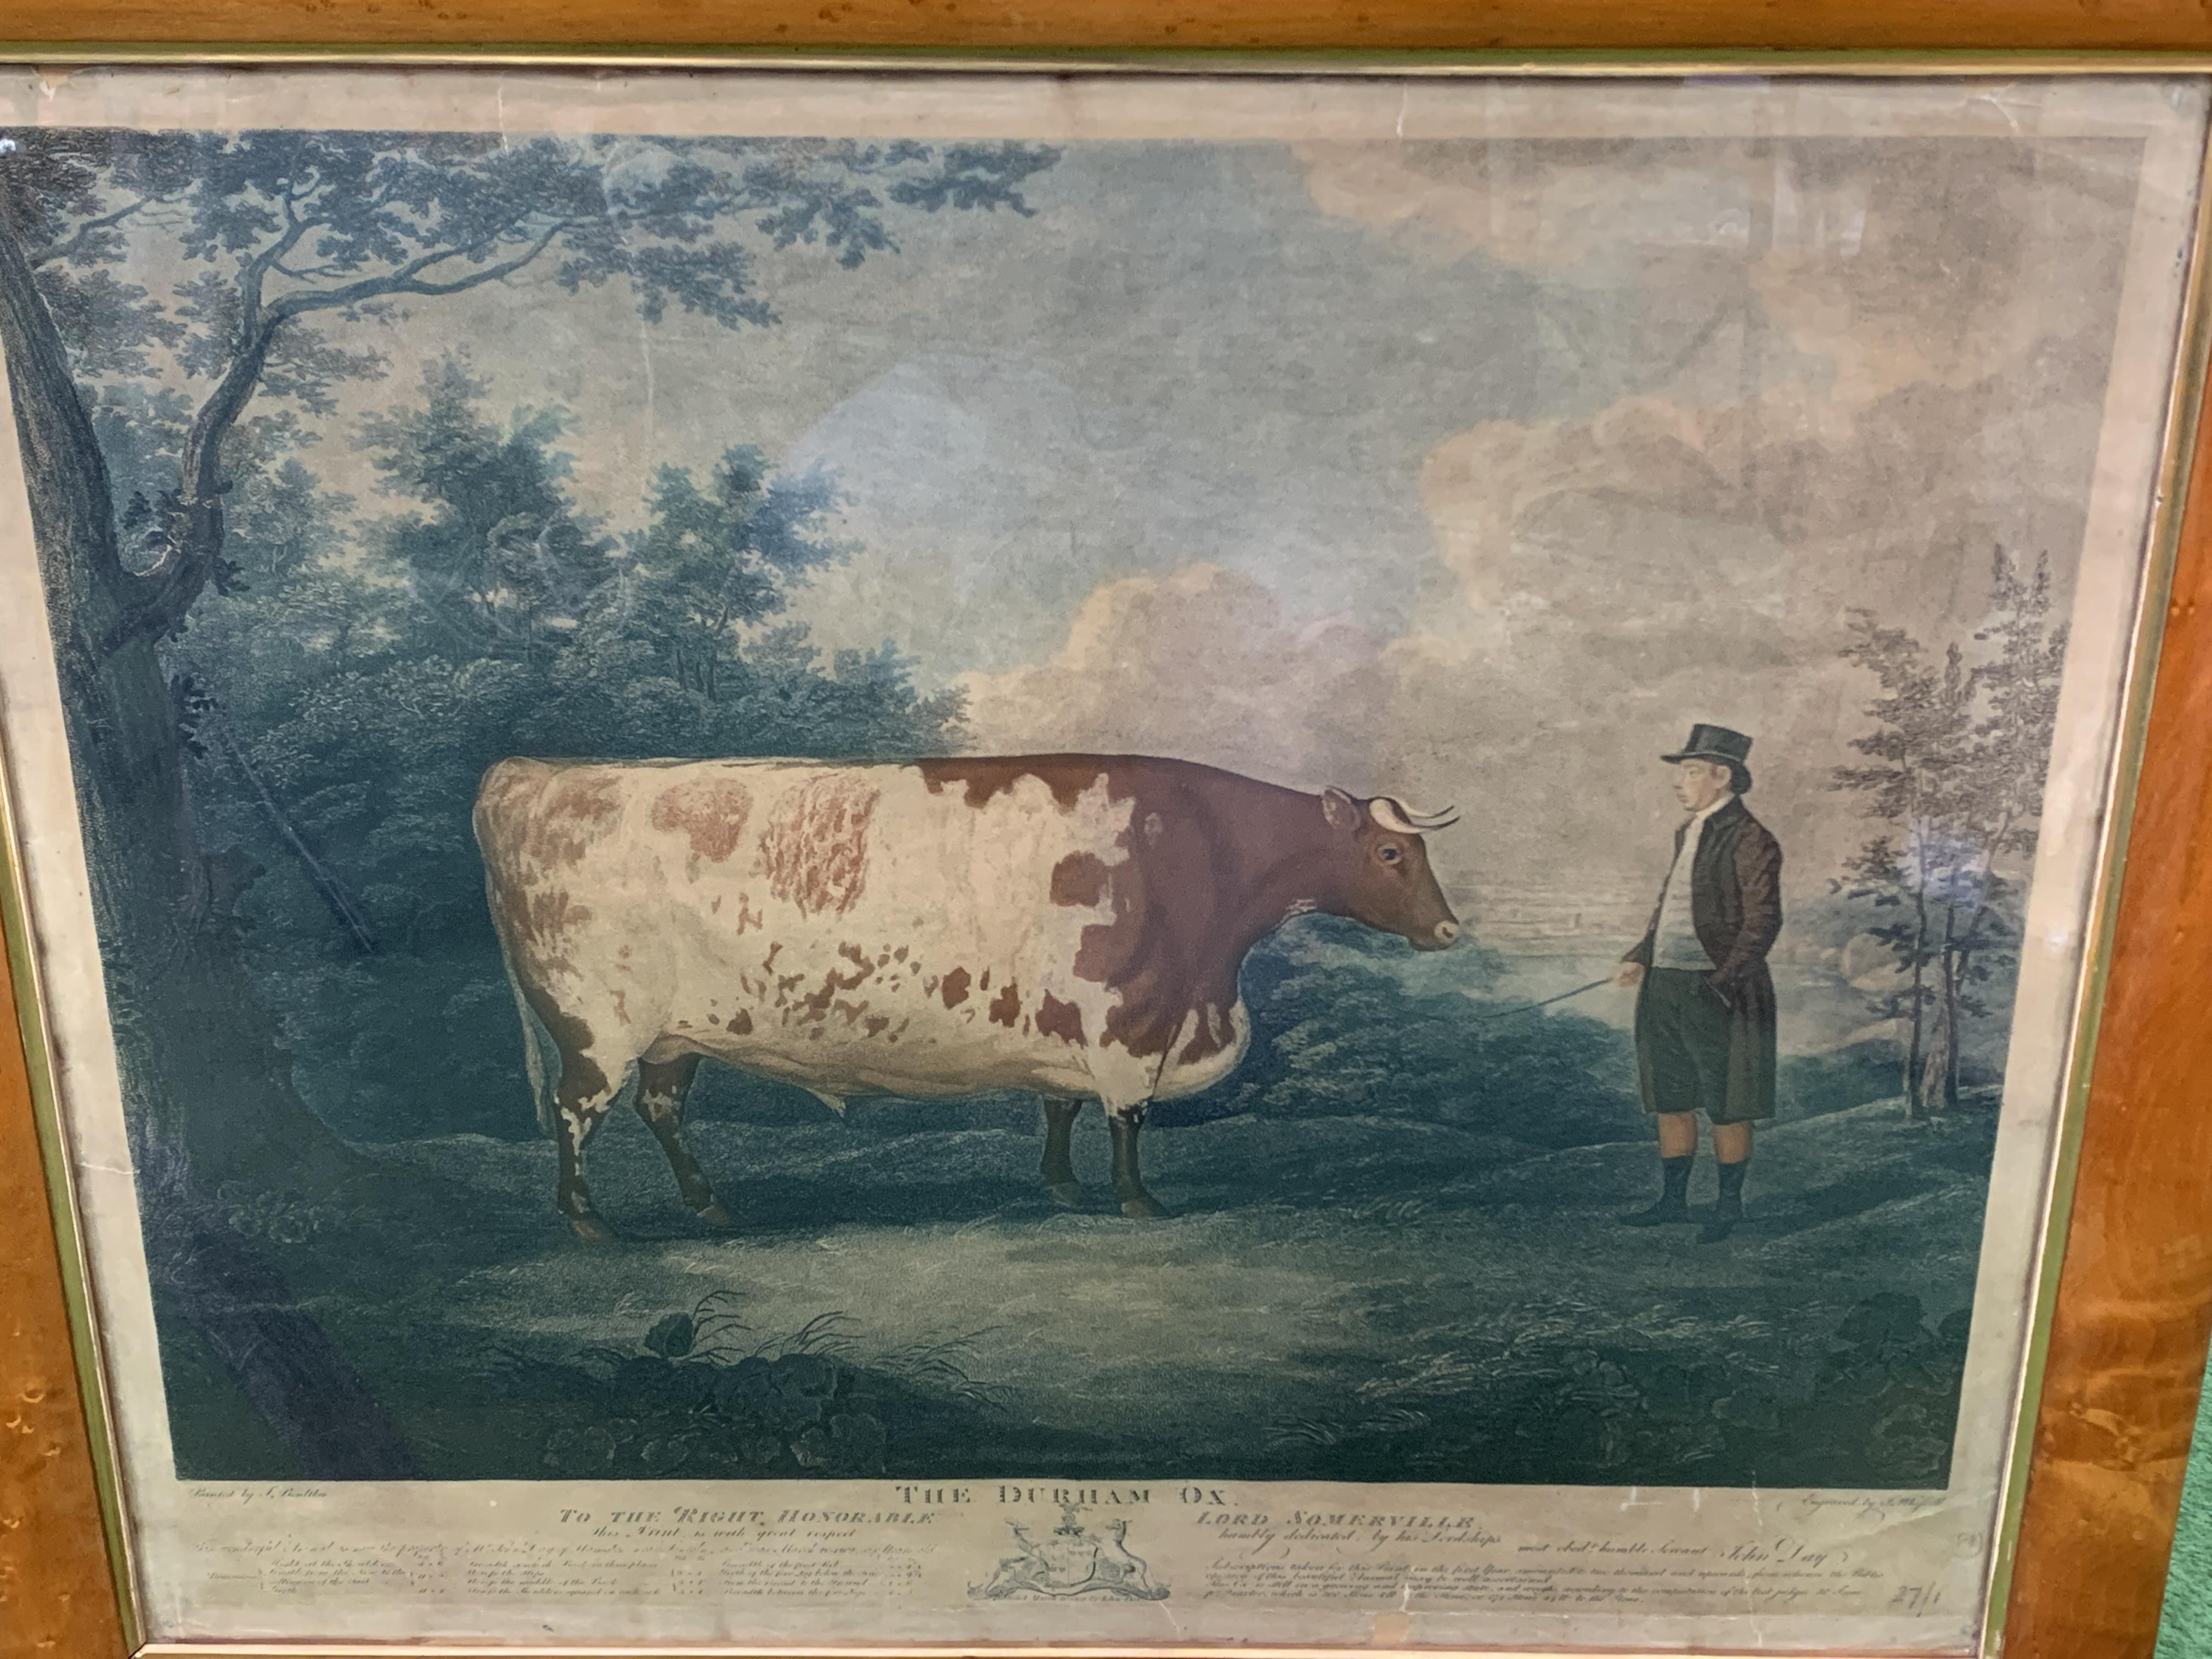 Fruit wood veneer framed and glazed coloured print of the Durham Ox - Image 2 of 3